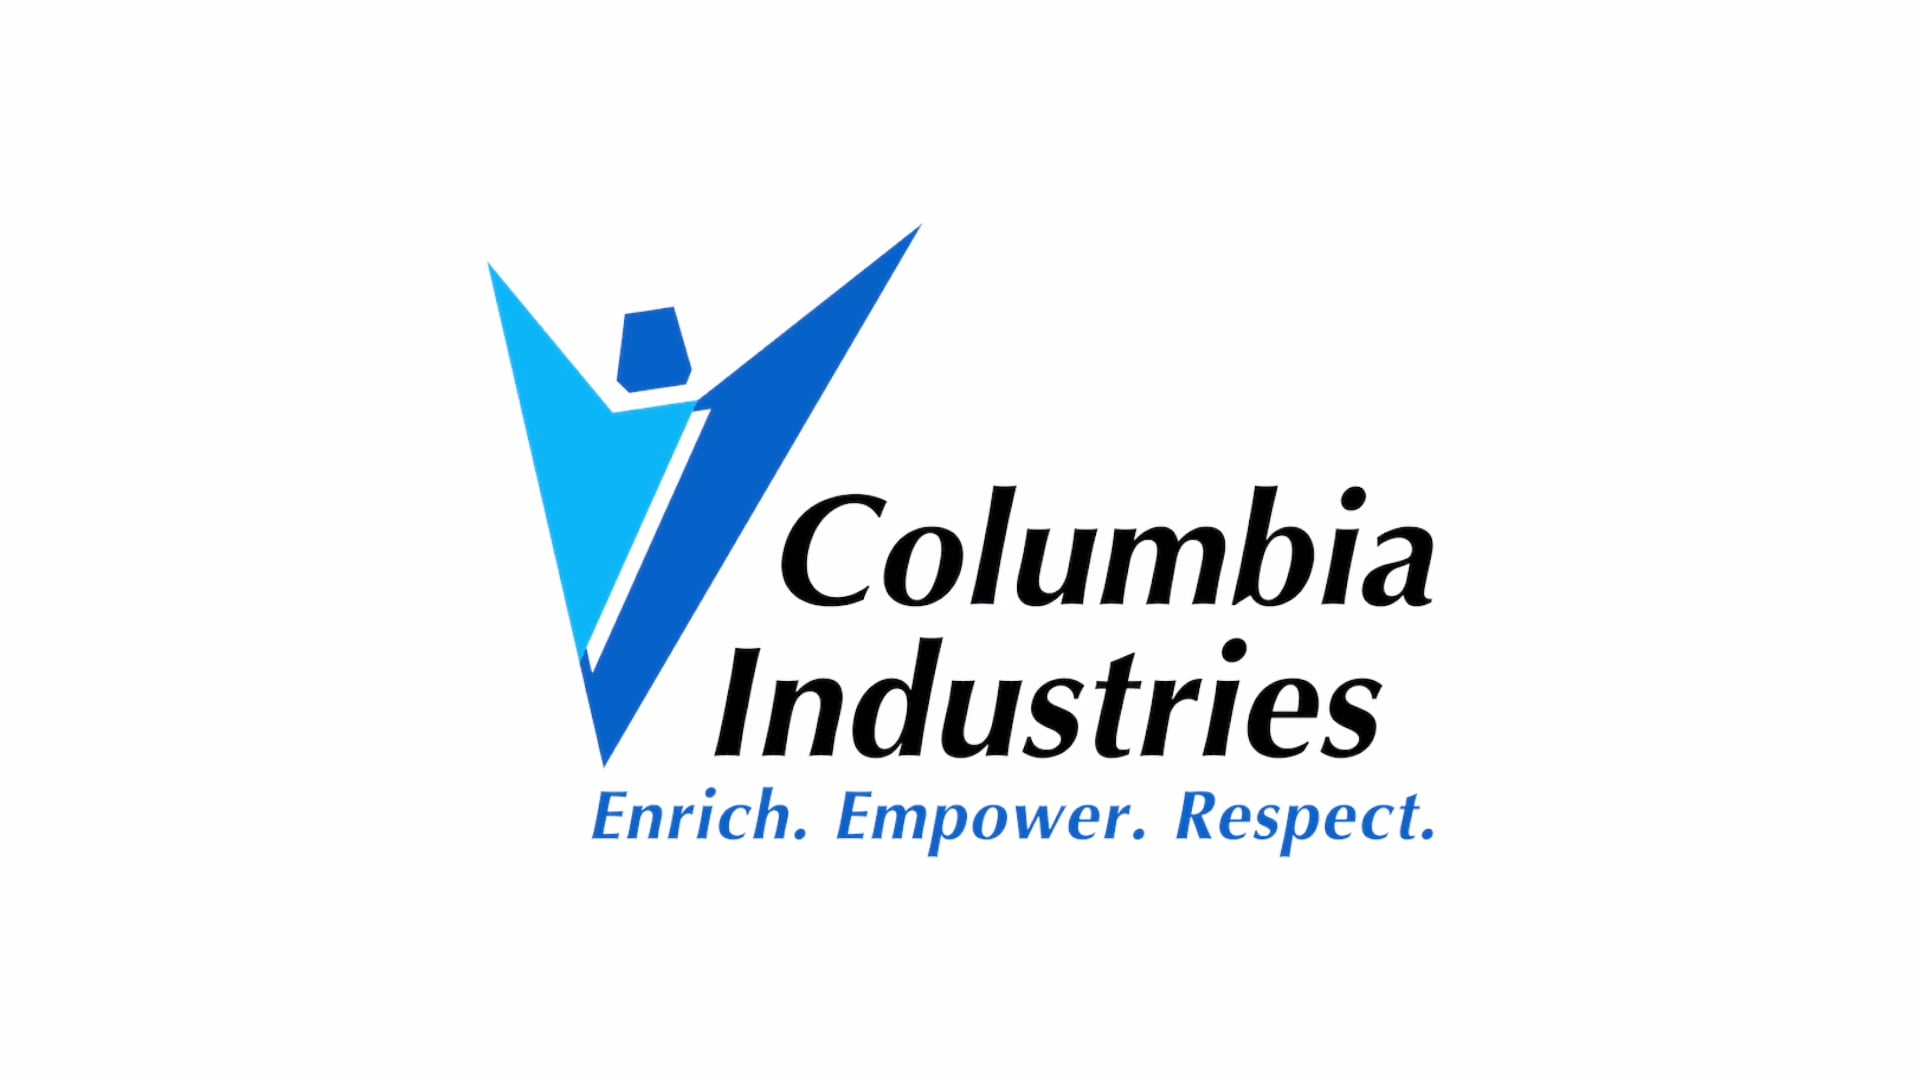 Columbia Industries